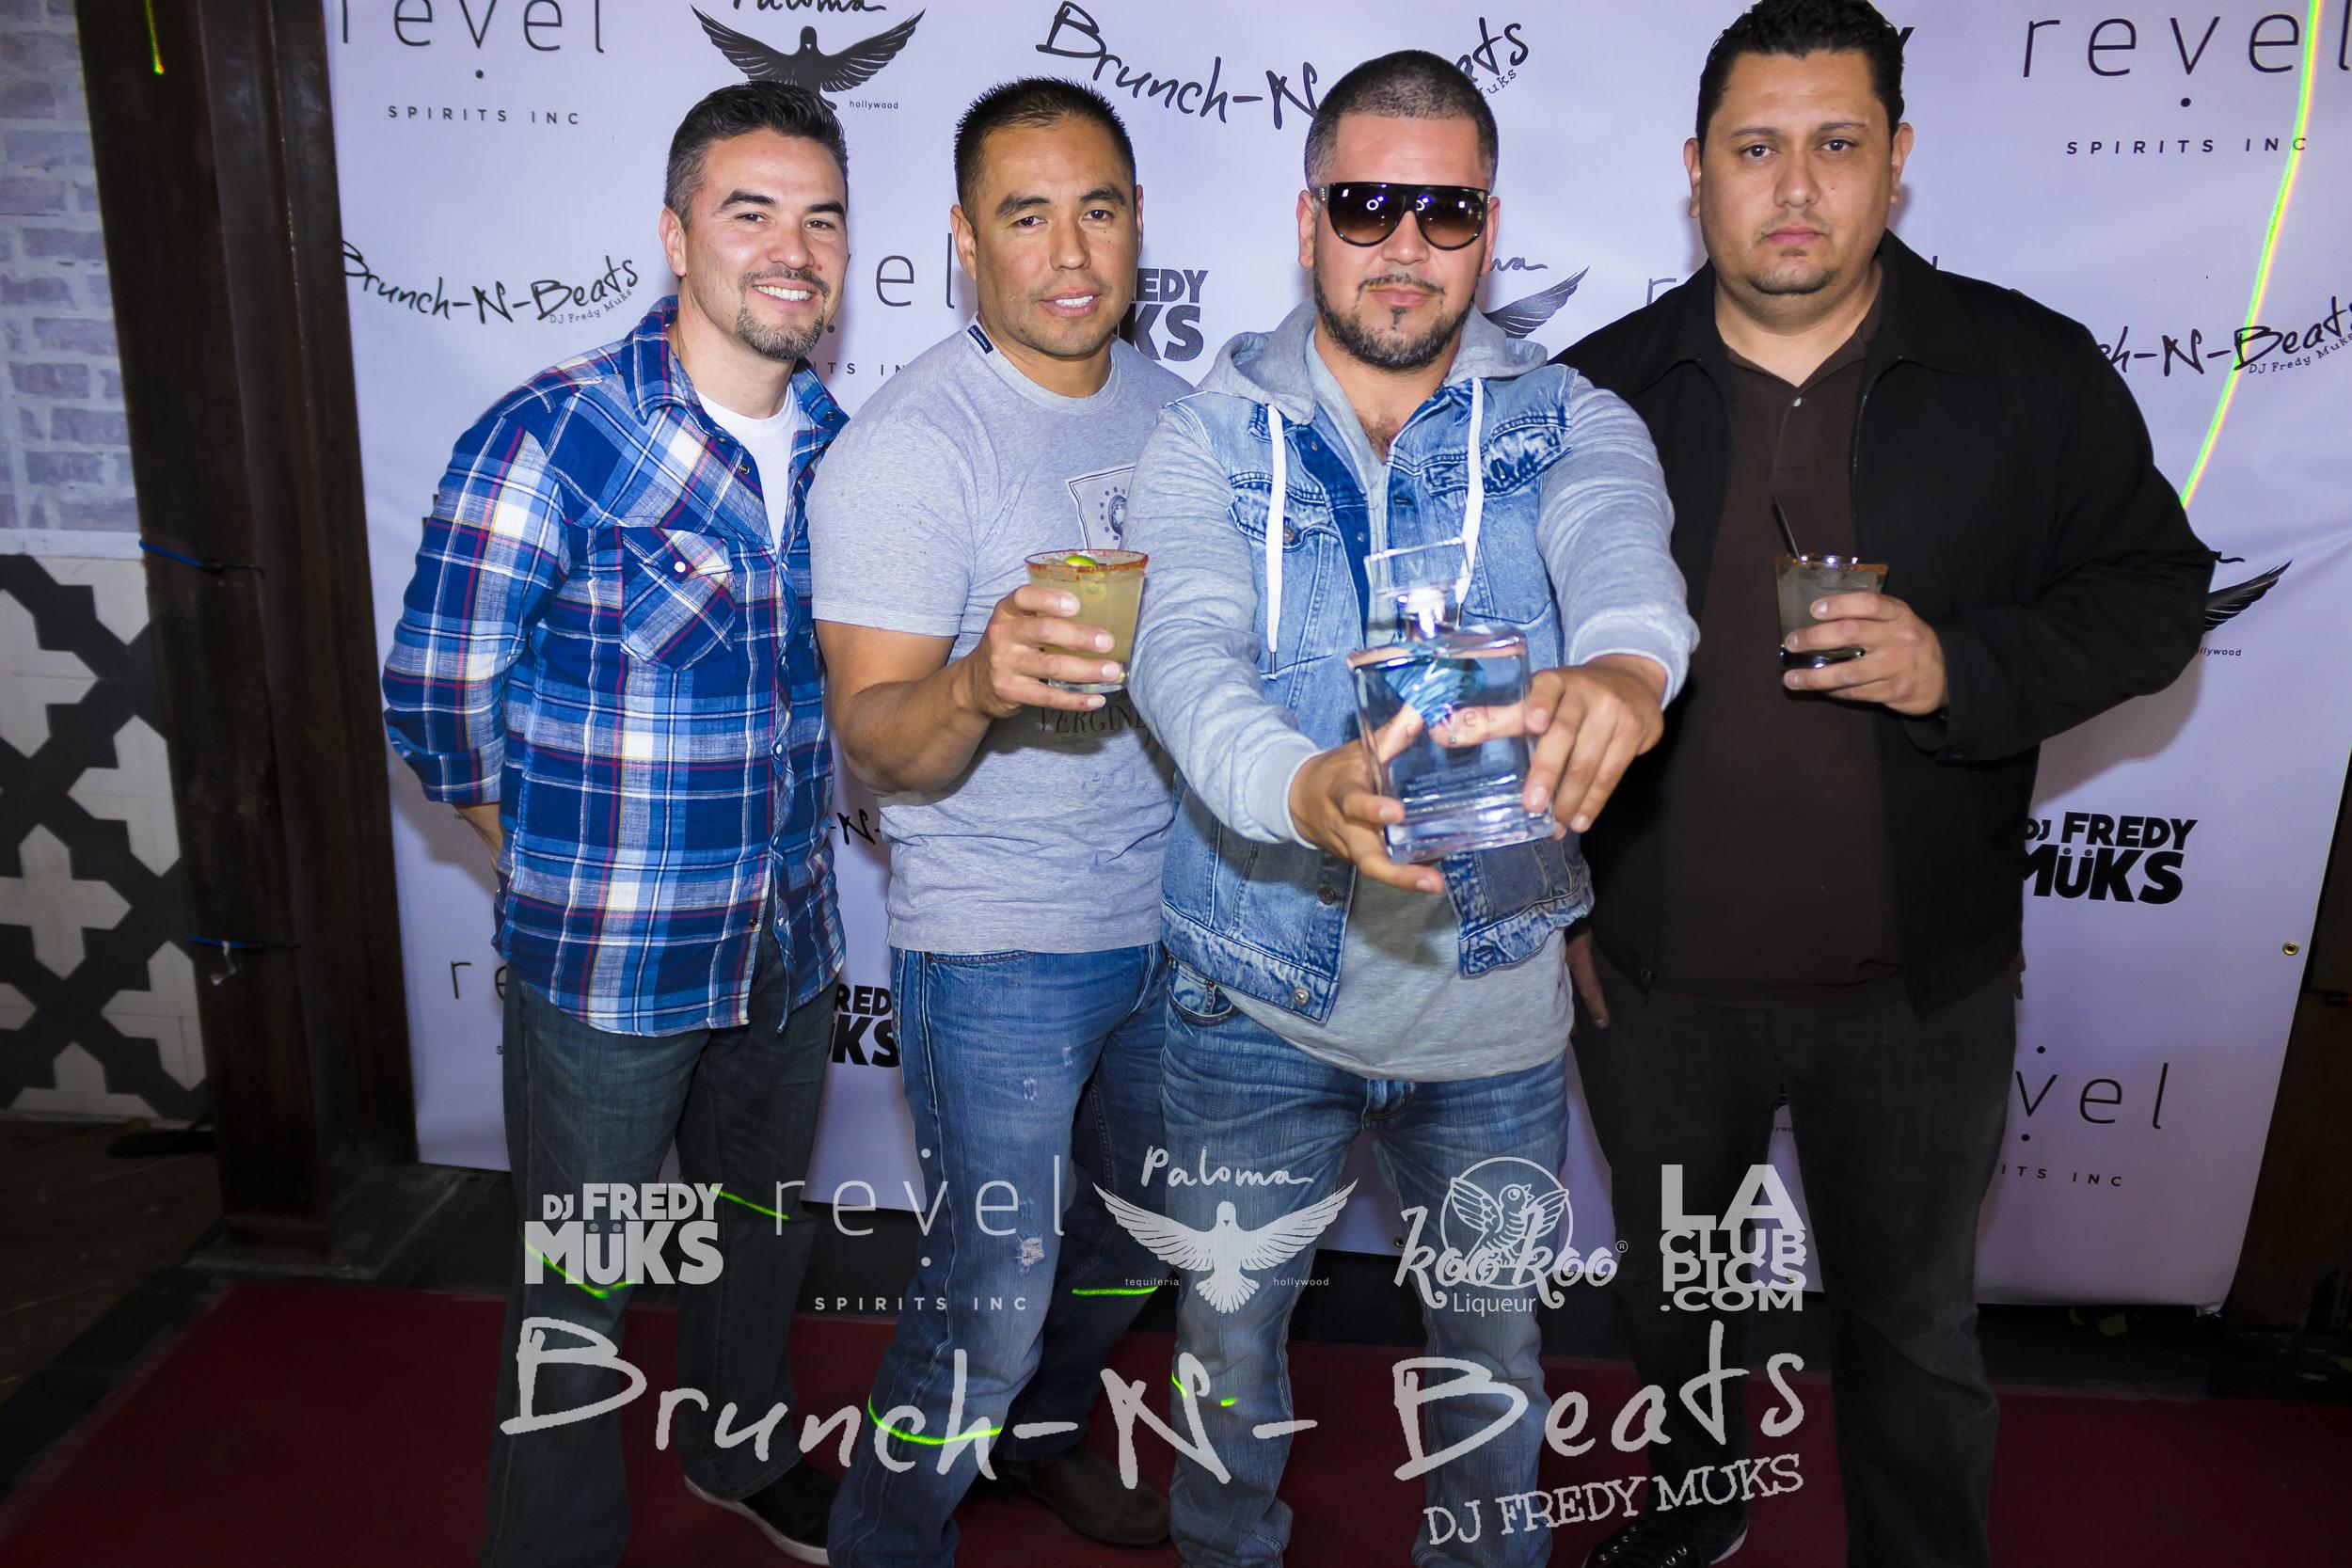 Brunch-N-Beats - Paloma Hollywood - 02-25-18_59.jpg